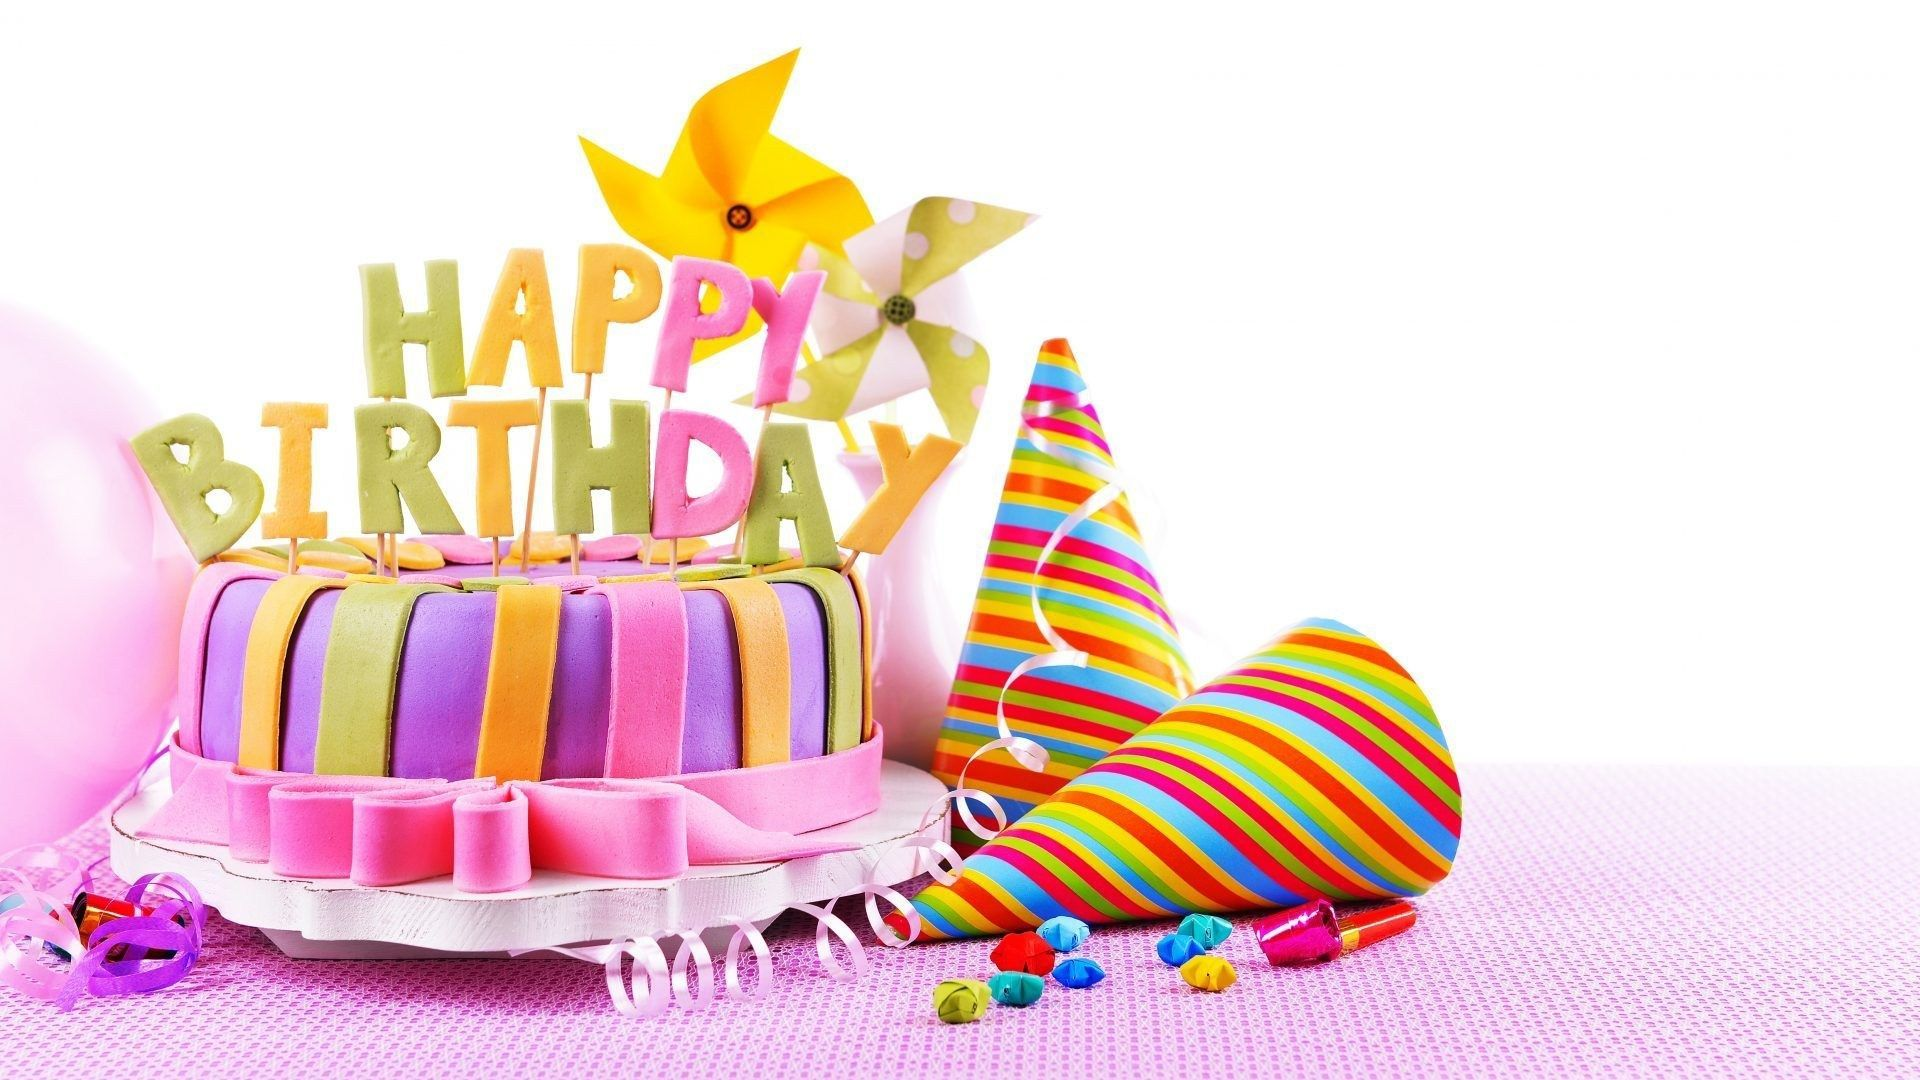 Birthday Cake Wallpapers Top Free Birthday Cake